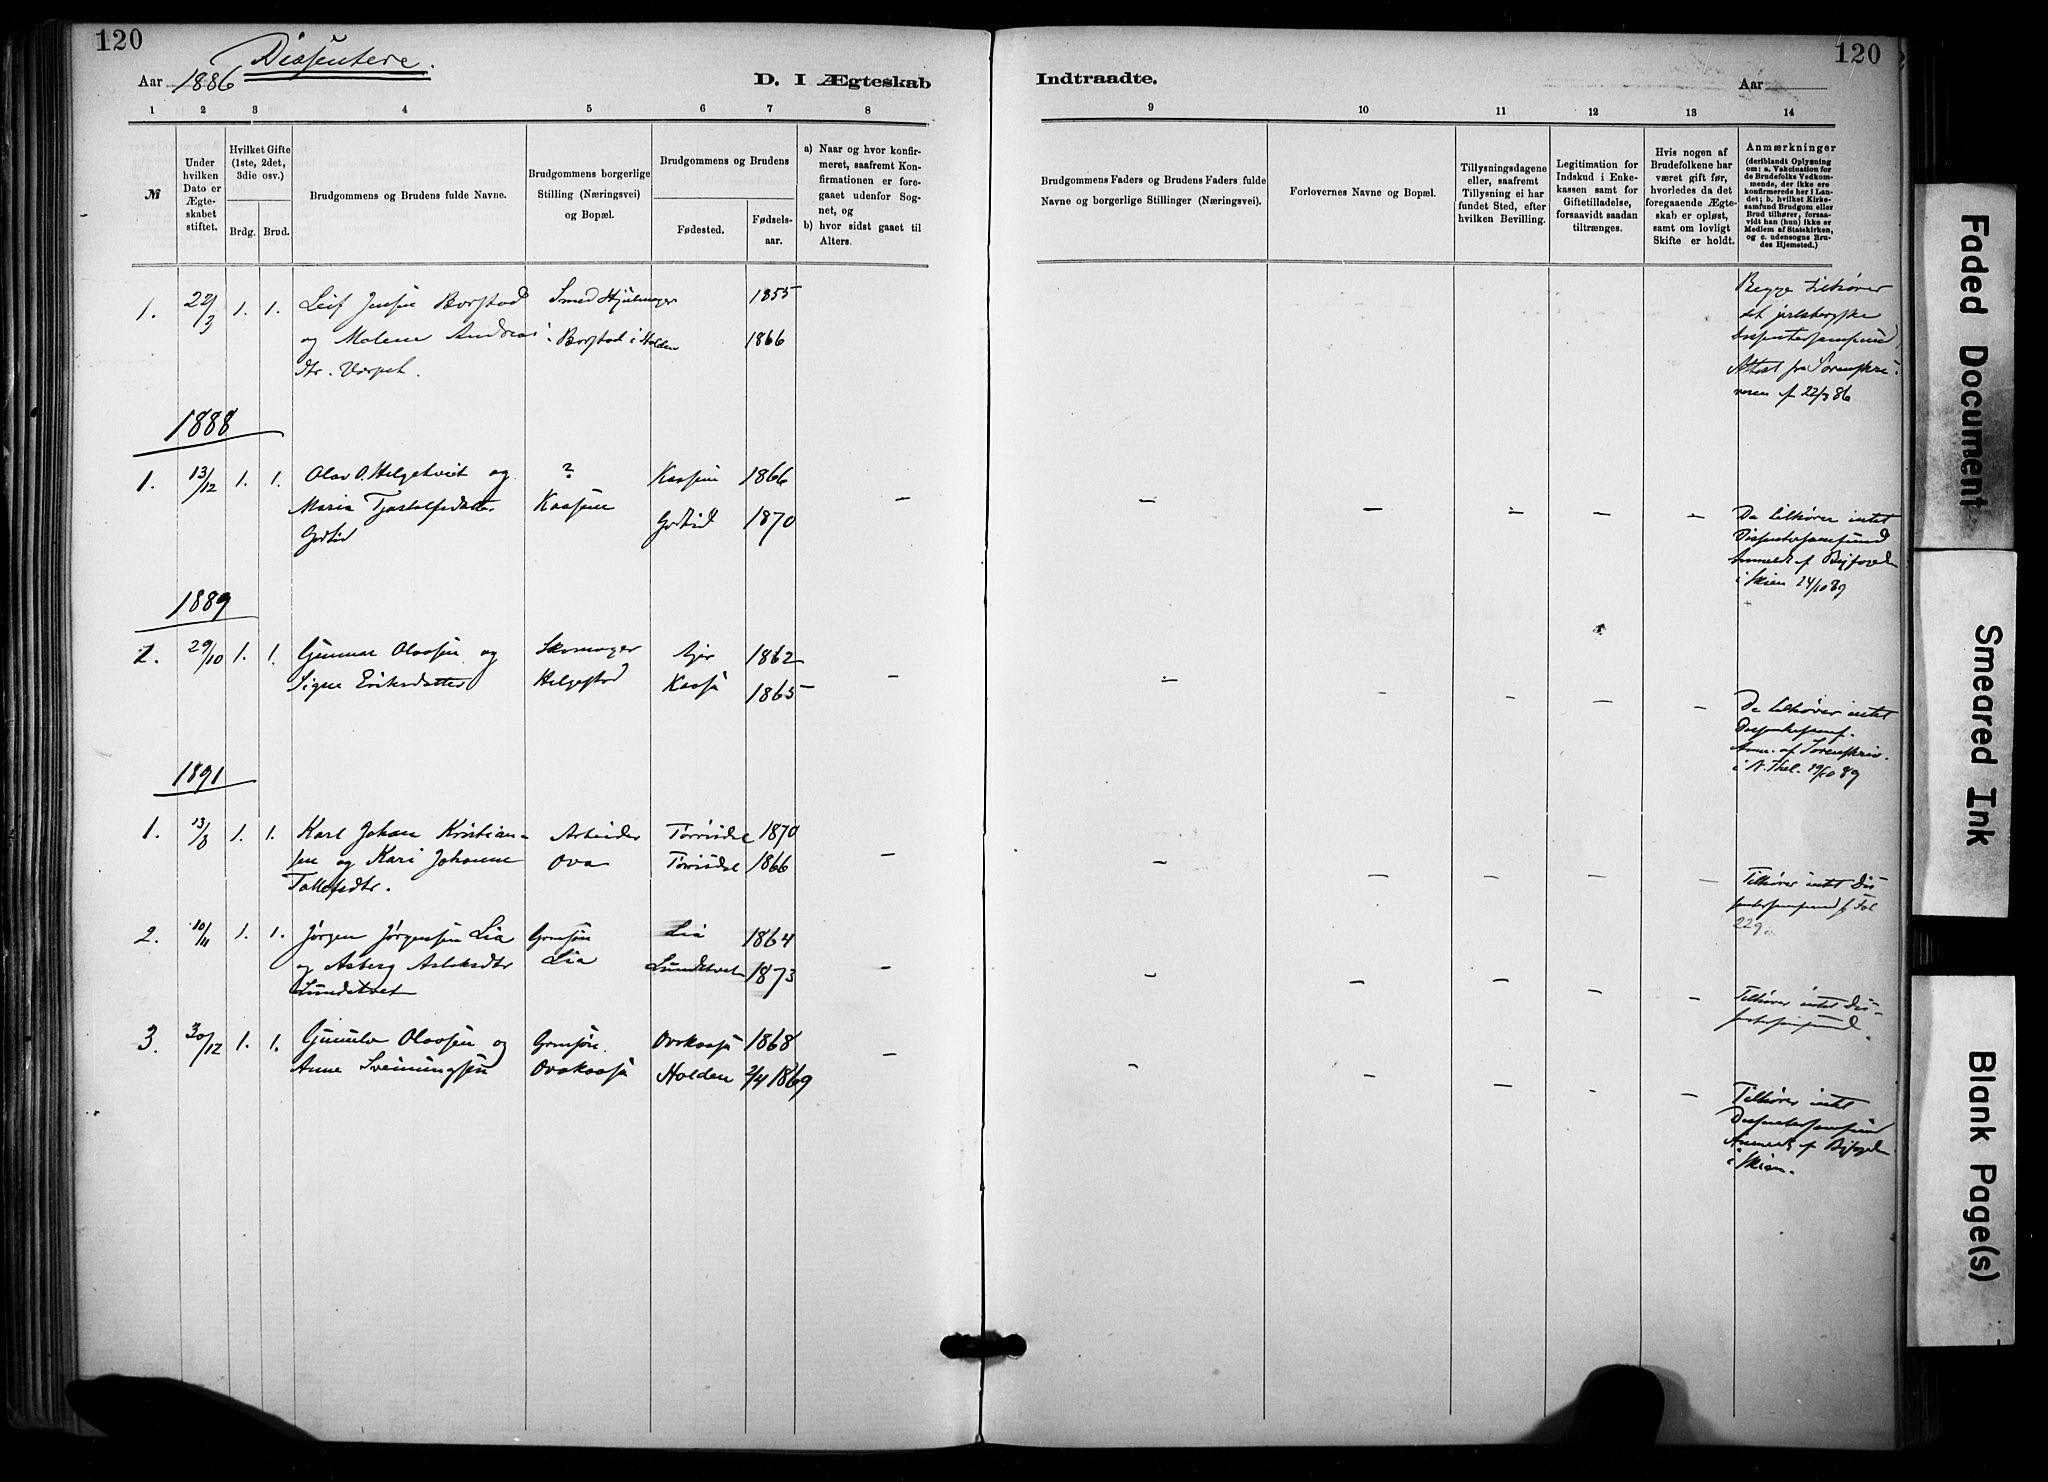 SAKO, Lunde kirkebøker, F/Fa/L0002: Ministerialbok nr. I 2, 1884-1892, s. 120